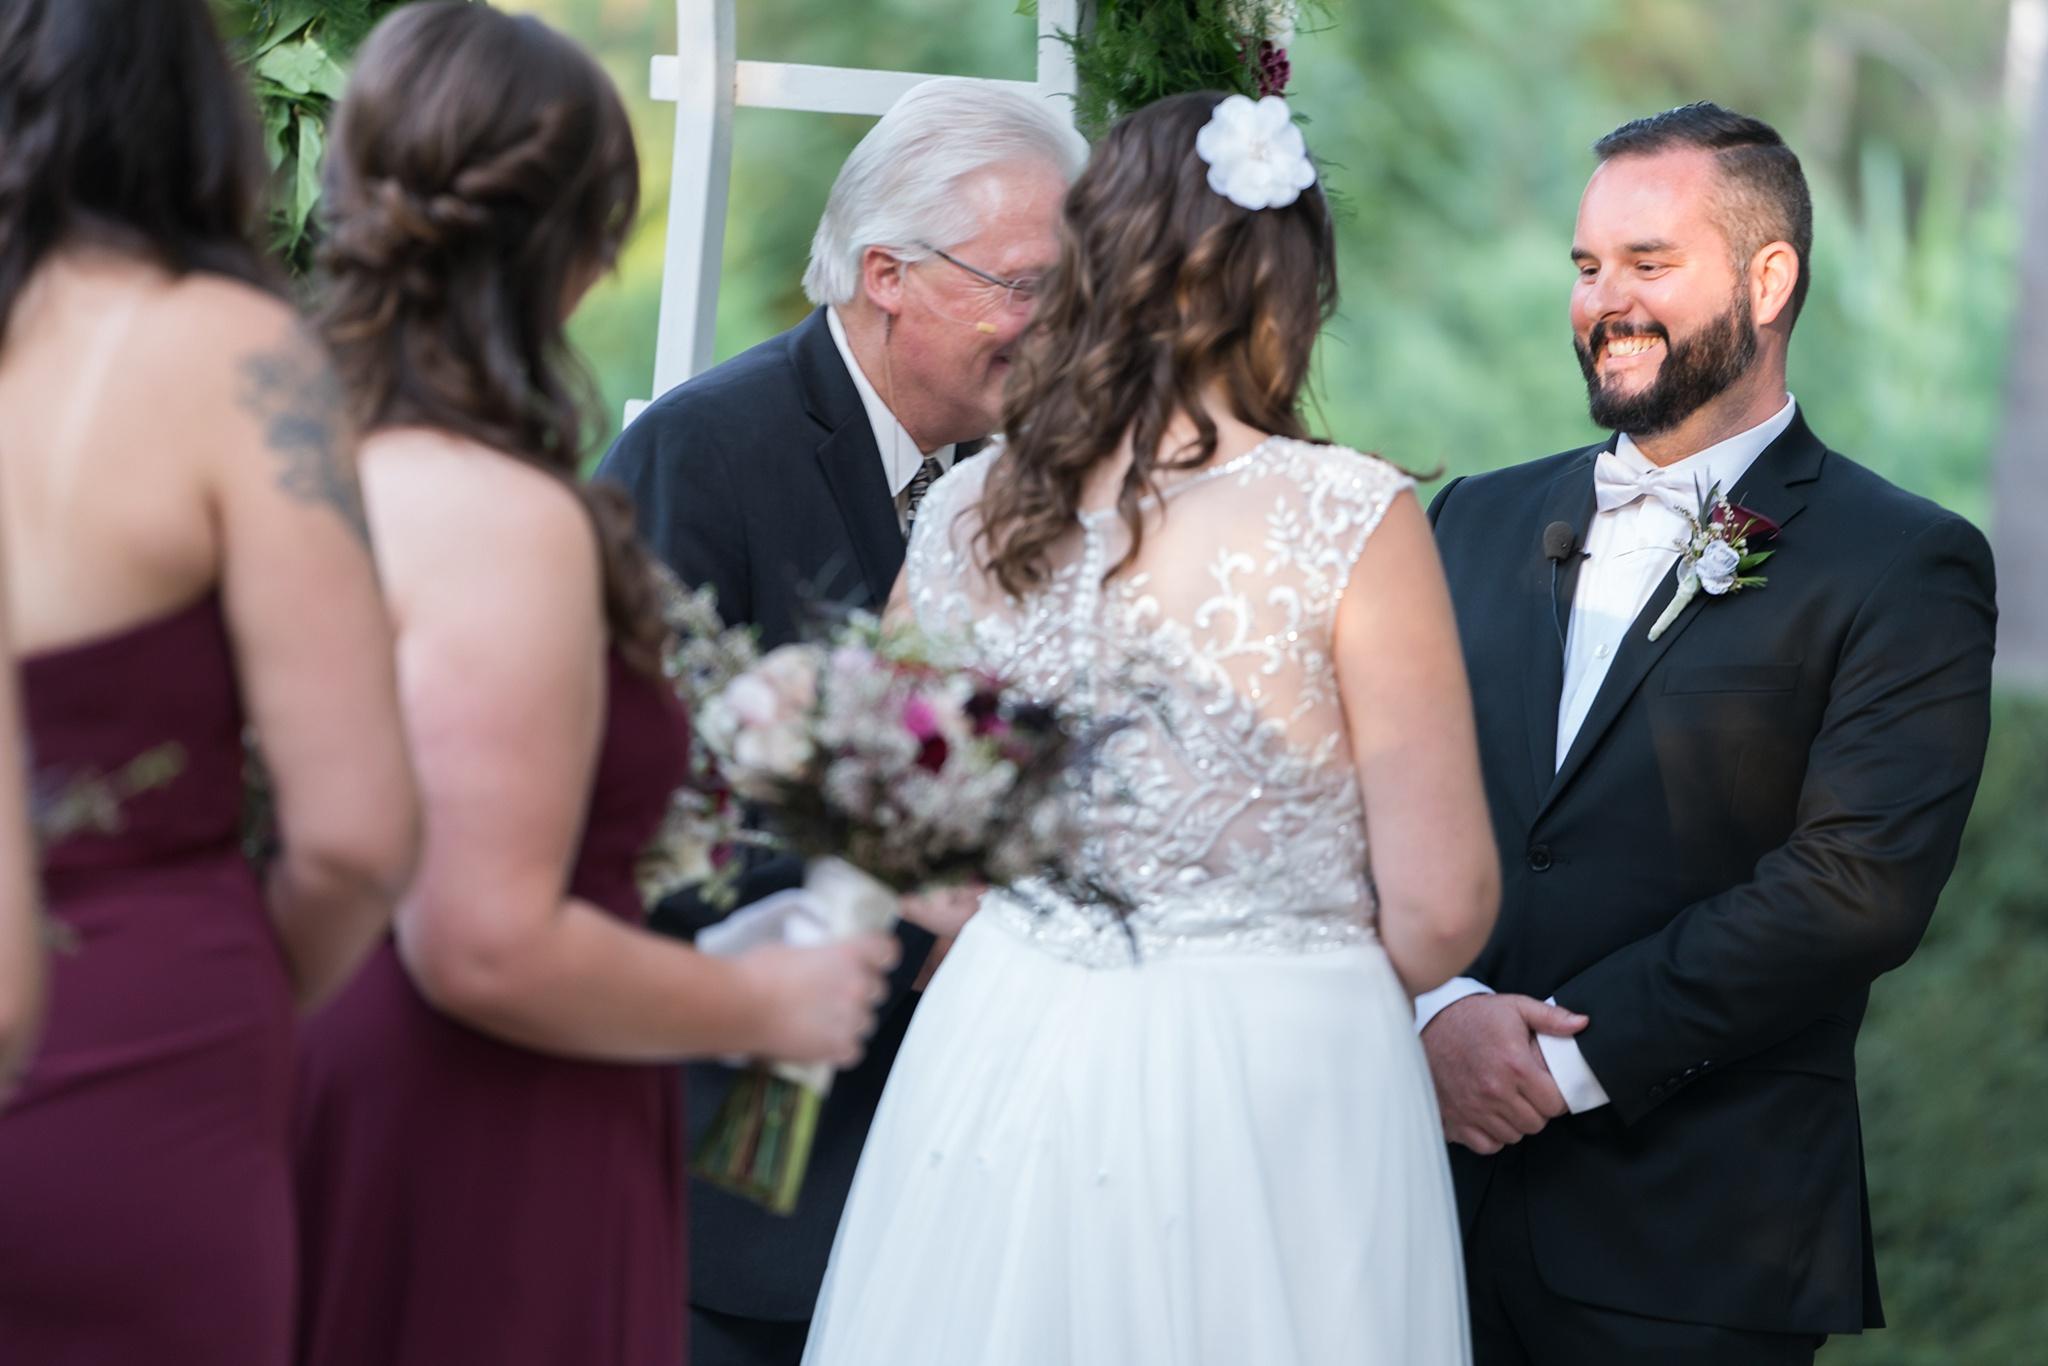 TommyandAmanda_WEDDING_BrienneMichelle_Ceremony_074_BLOG.jpg